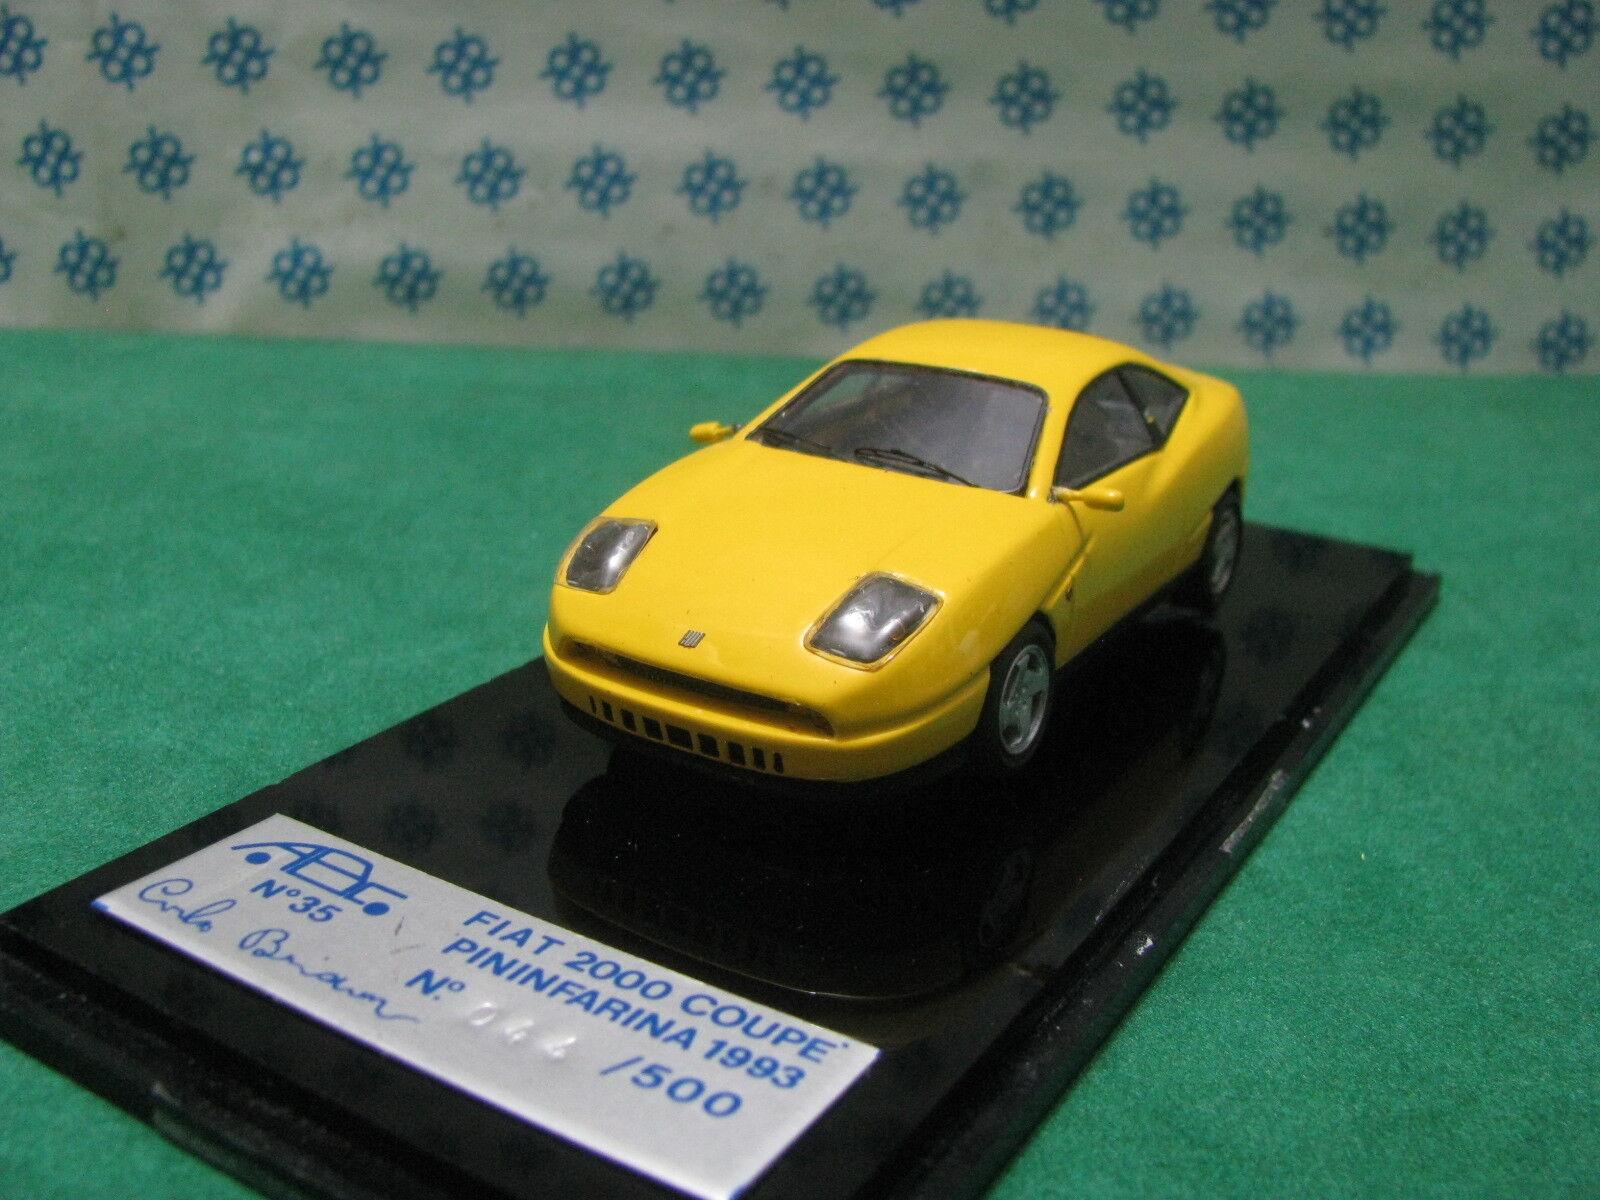 Vintage  - FIAT 2000 Coupè Pinin Farina 1993 -  1 43 ABC Brianza  Built Factory